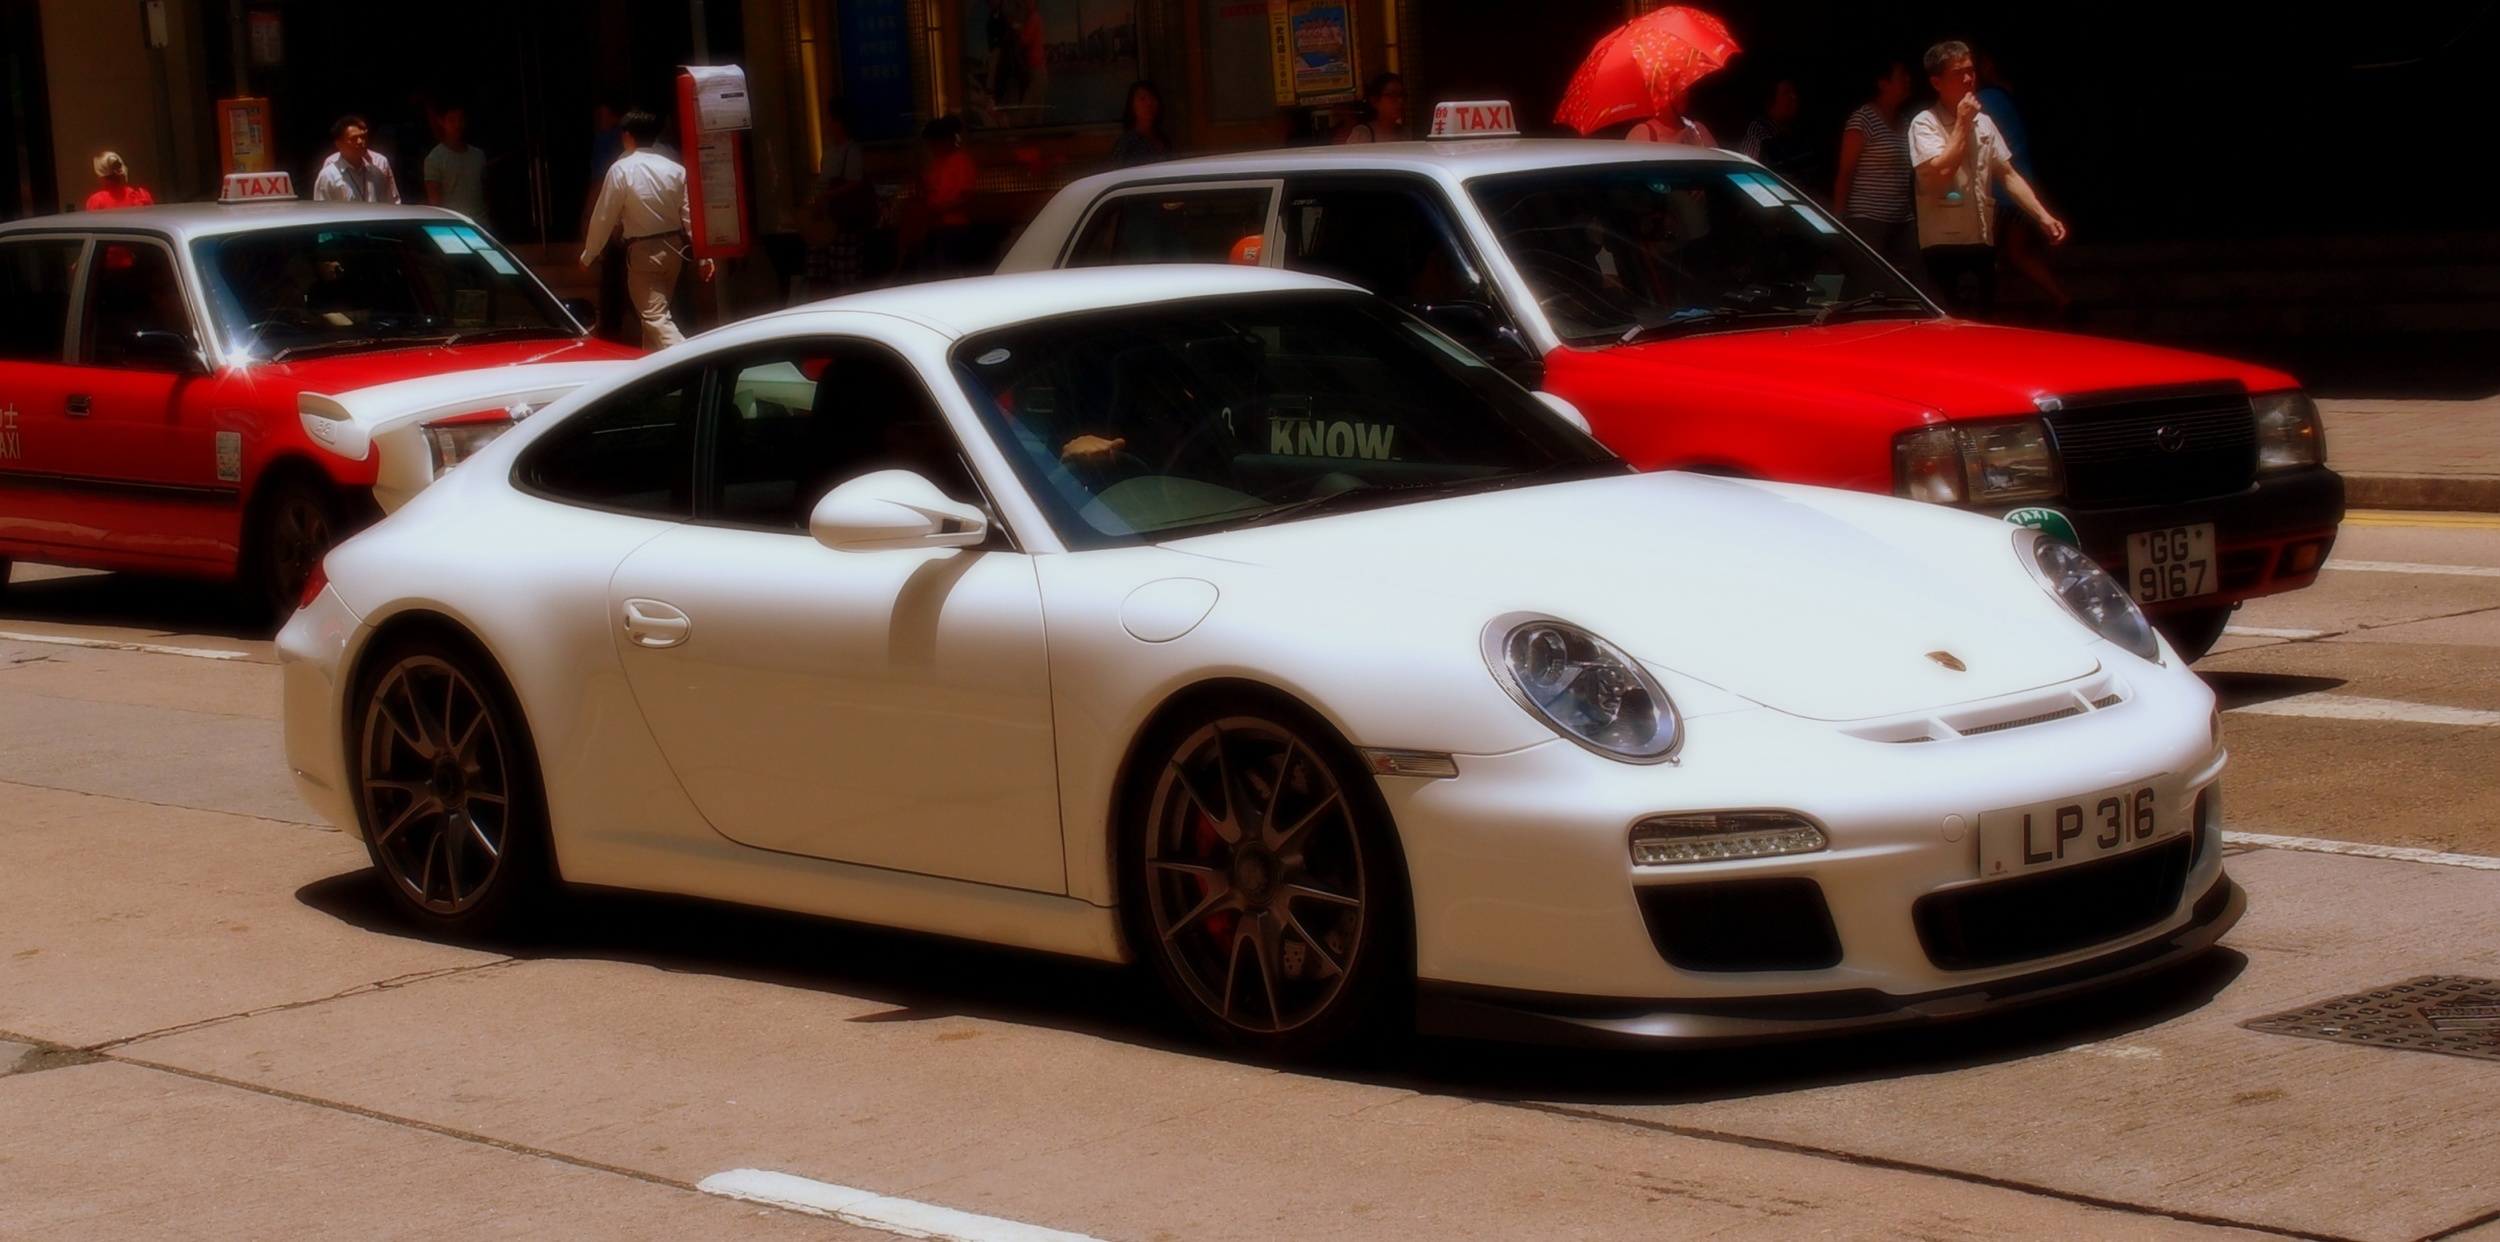 A Porsche on Pedder Street